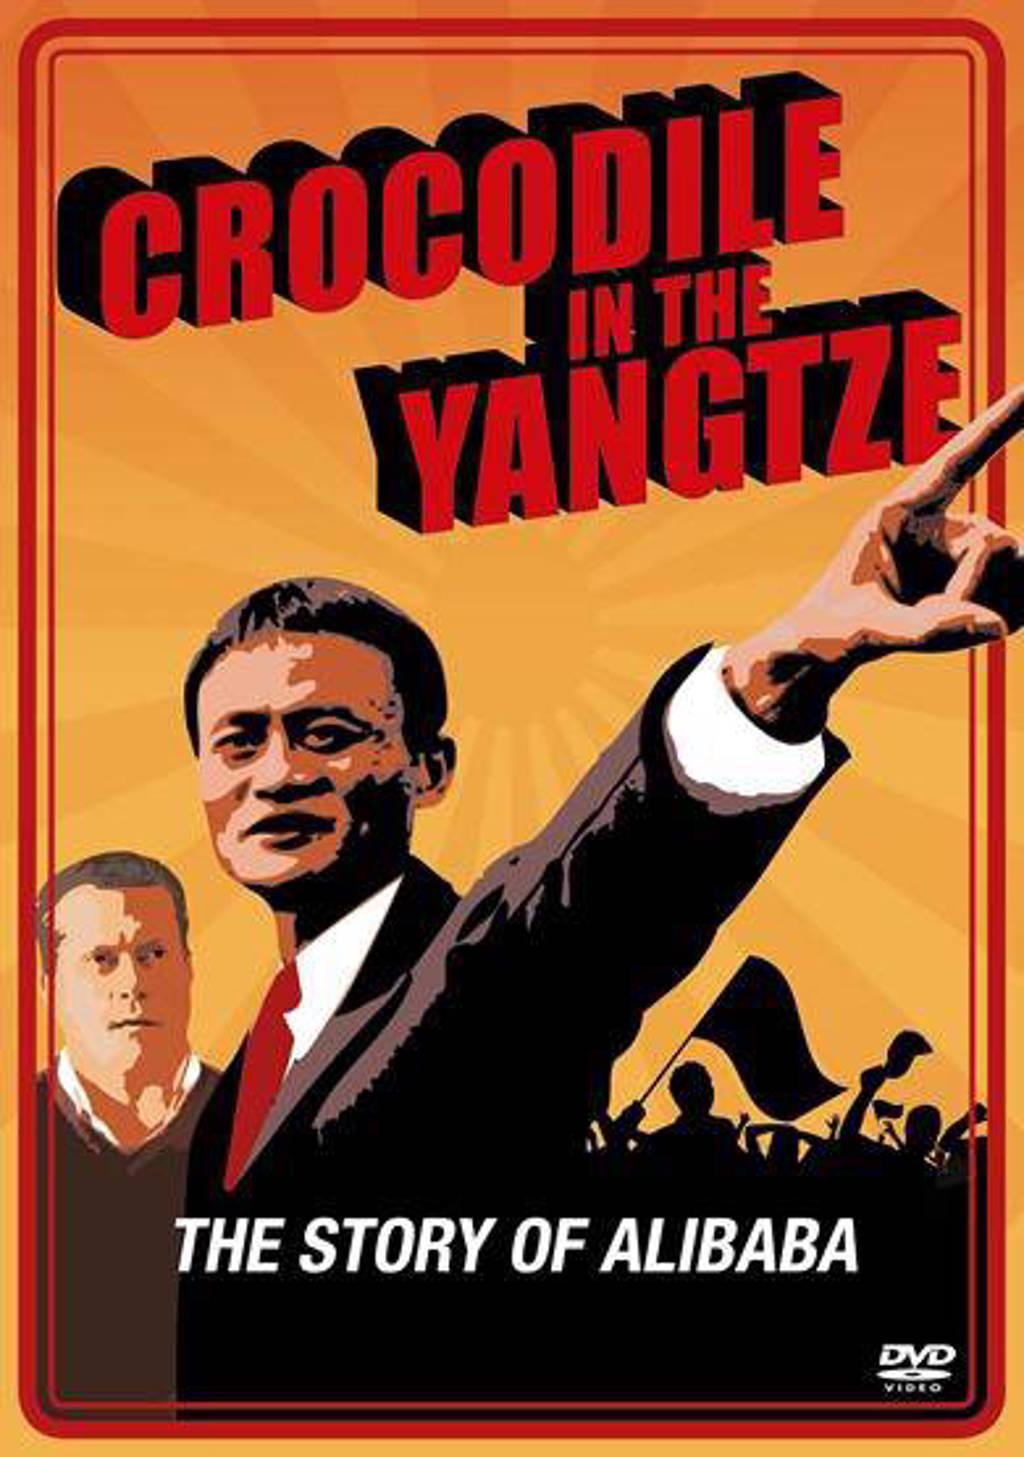 Crocodile in the yangtze - The story of Alibaba (DVD)